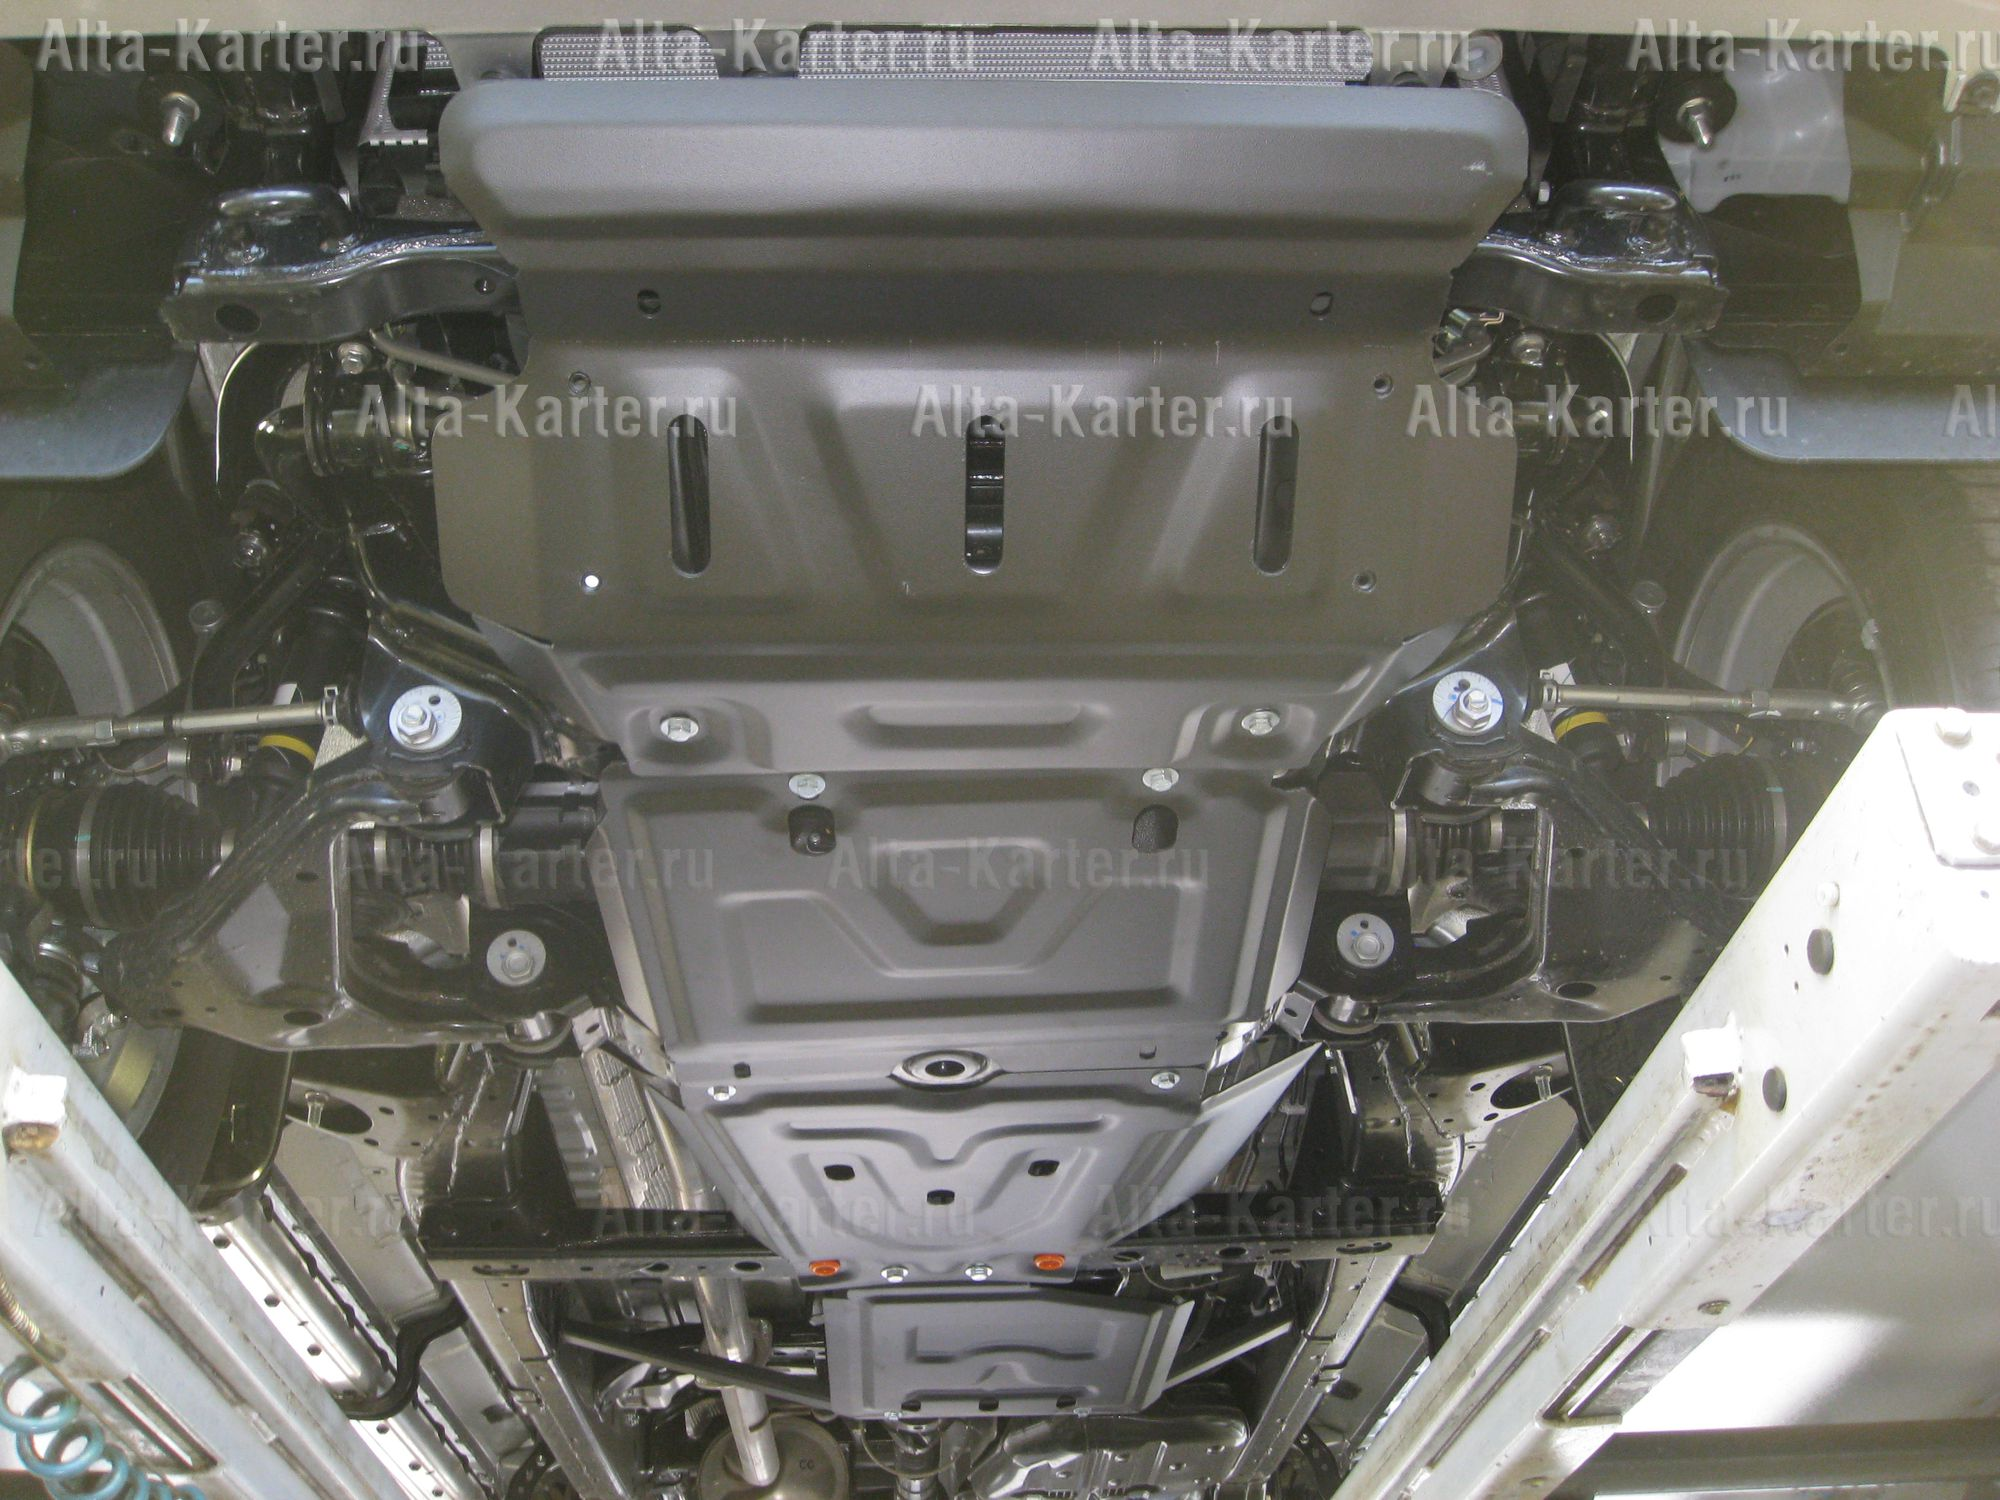 Защита Alfeco для радиатора, картера, редуктора переднего моста, КПП, раздатки Toyota Hilux VIII 2015-2021. Артикул ALF.24.90,91,92,93